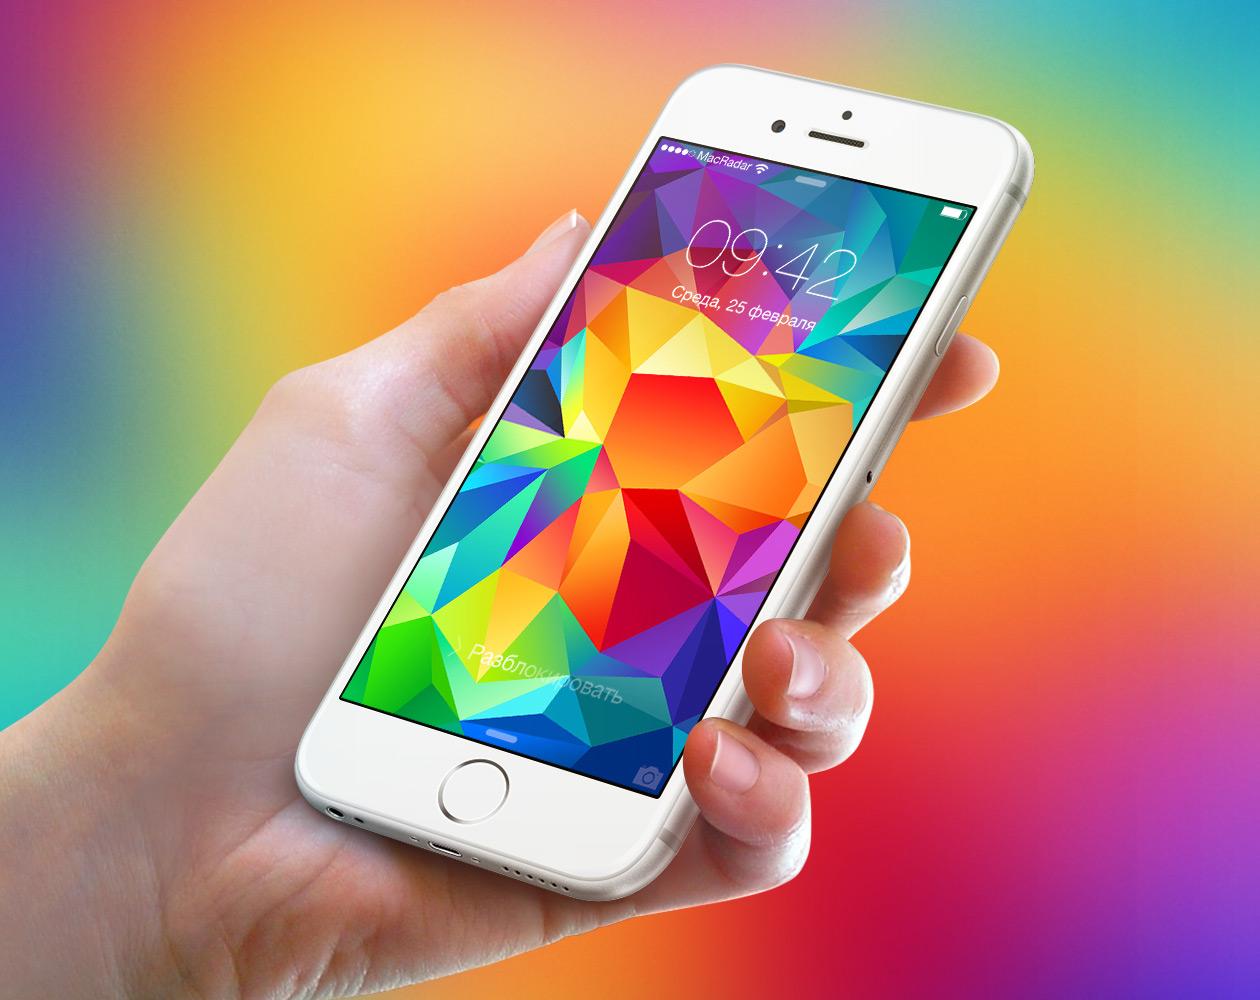 Обои для iPhone: Евклидова геометрика II